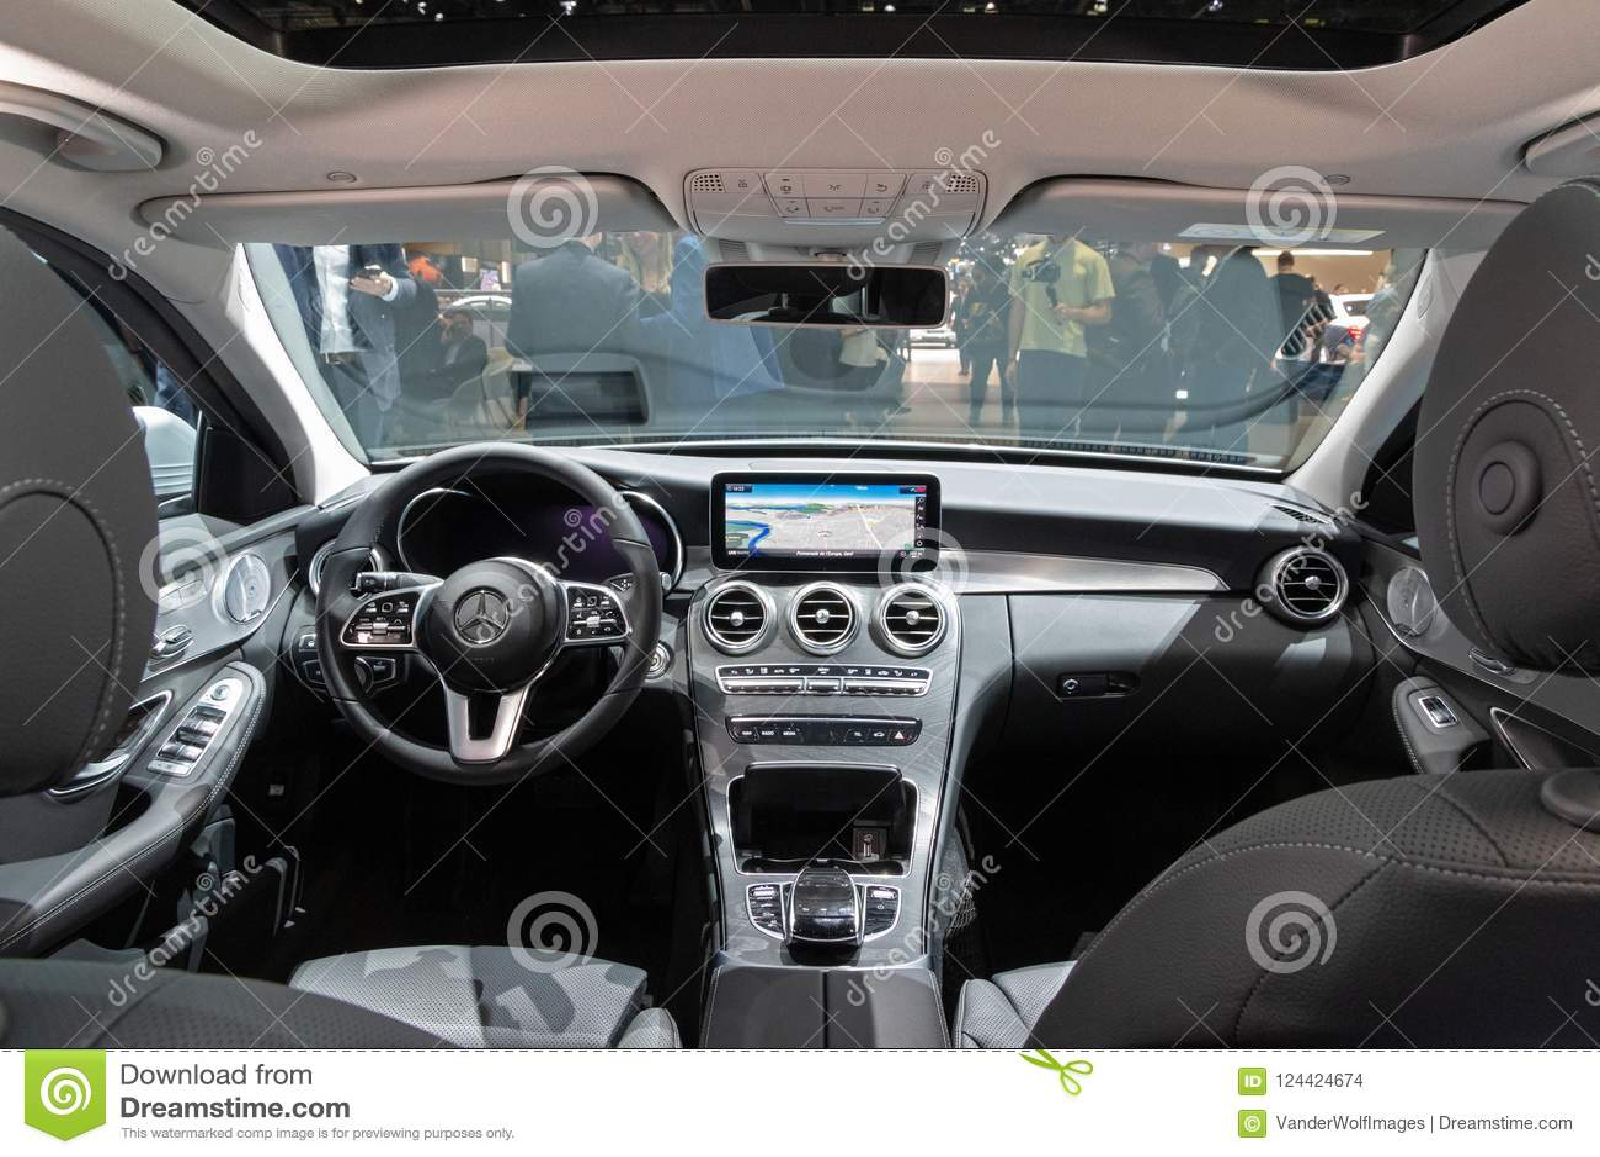 mercedes benz c class hybrid car interior editorial stock. Black Bedroom Furniture Sets. Home Design Ideas